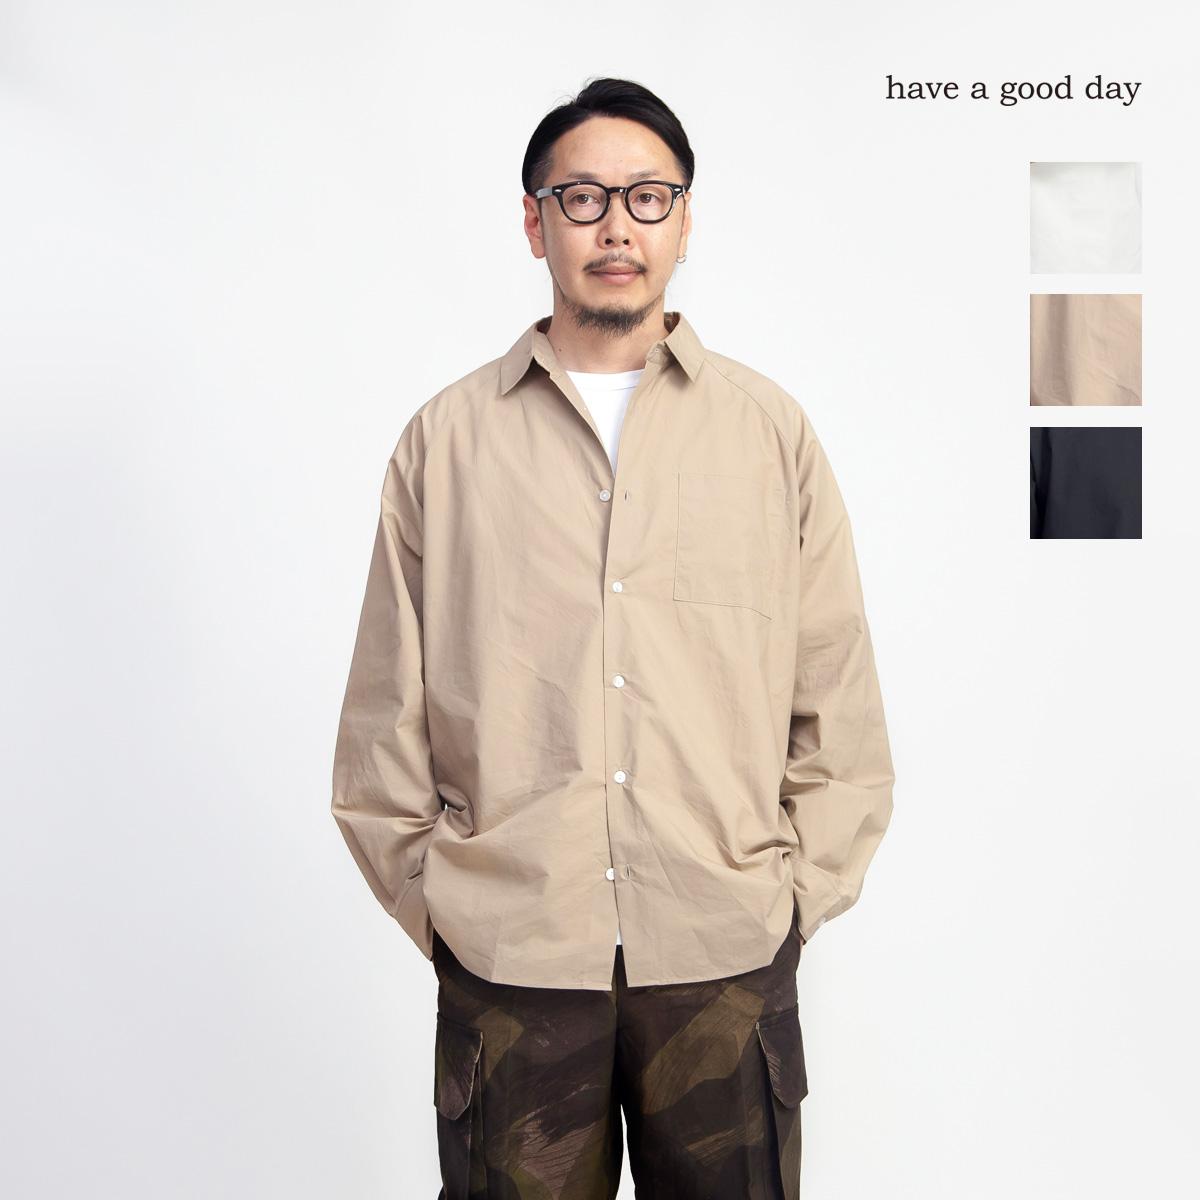 have a good day ハブアグッドデイ タイプライター ラグランスリーブシャツ 日本製 メンズ